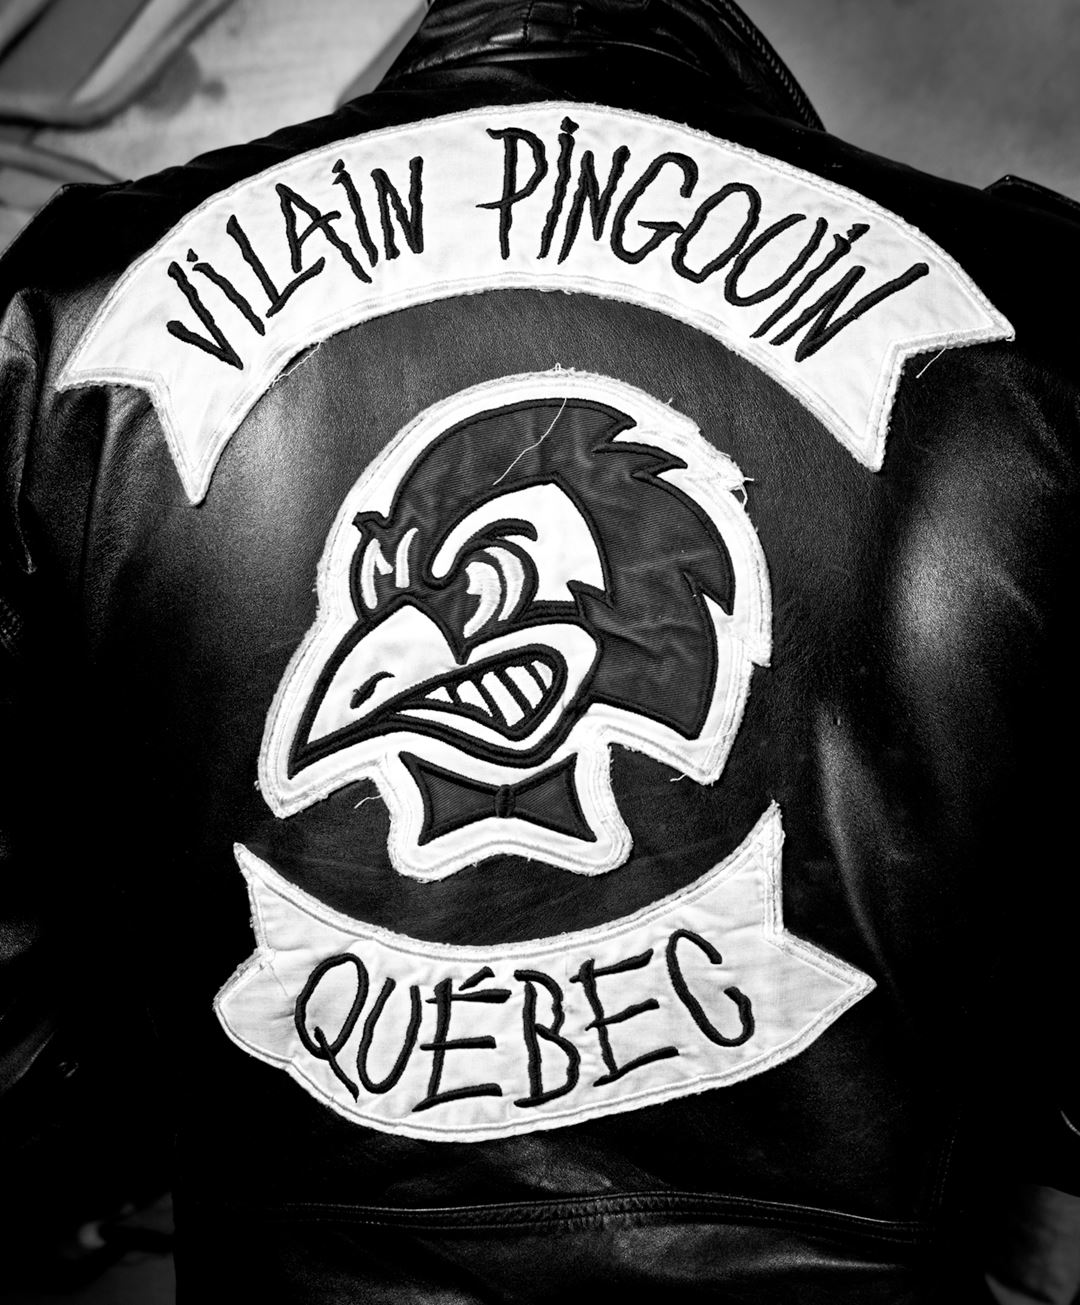 Villain Pingouin